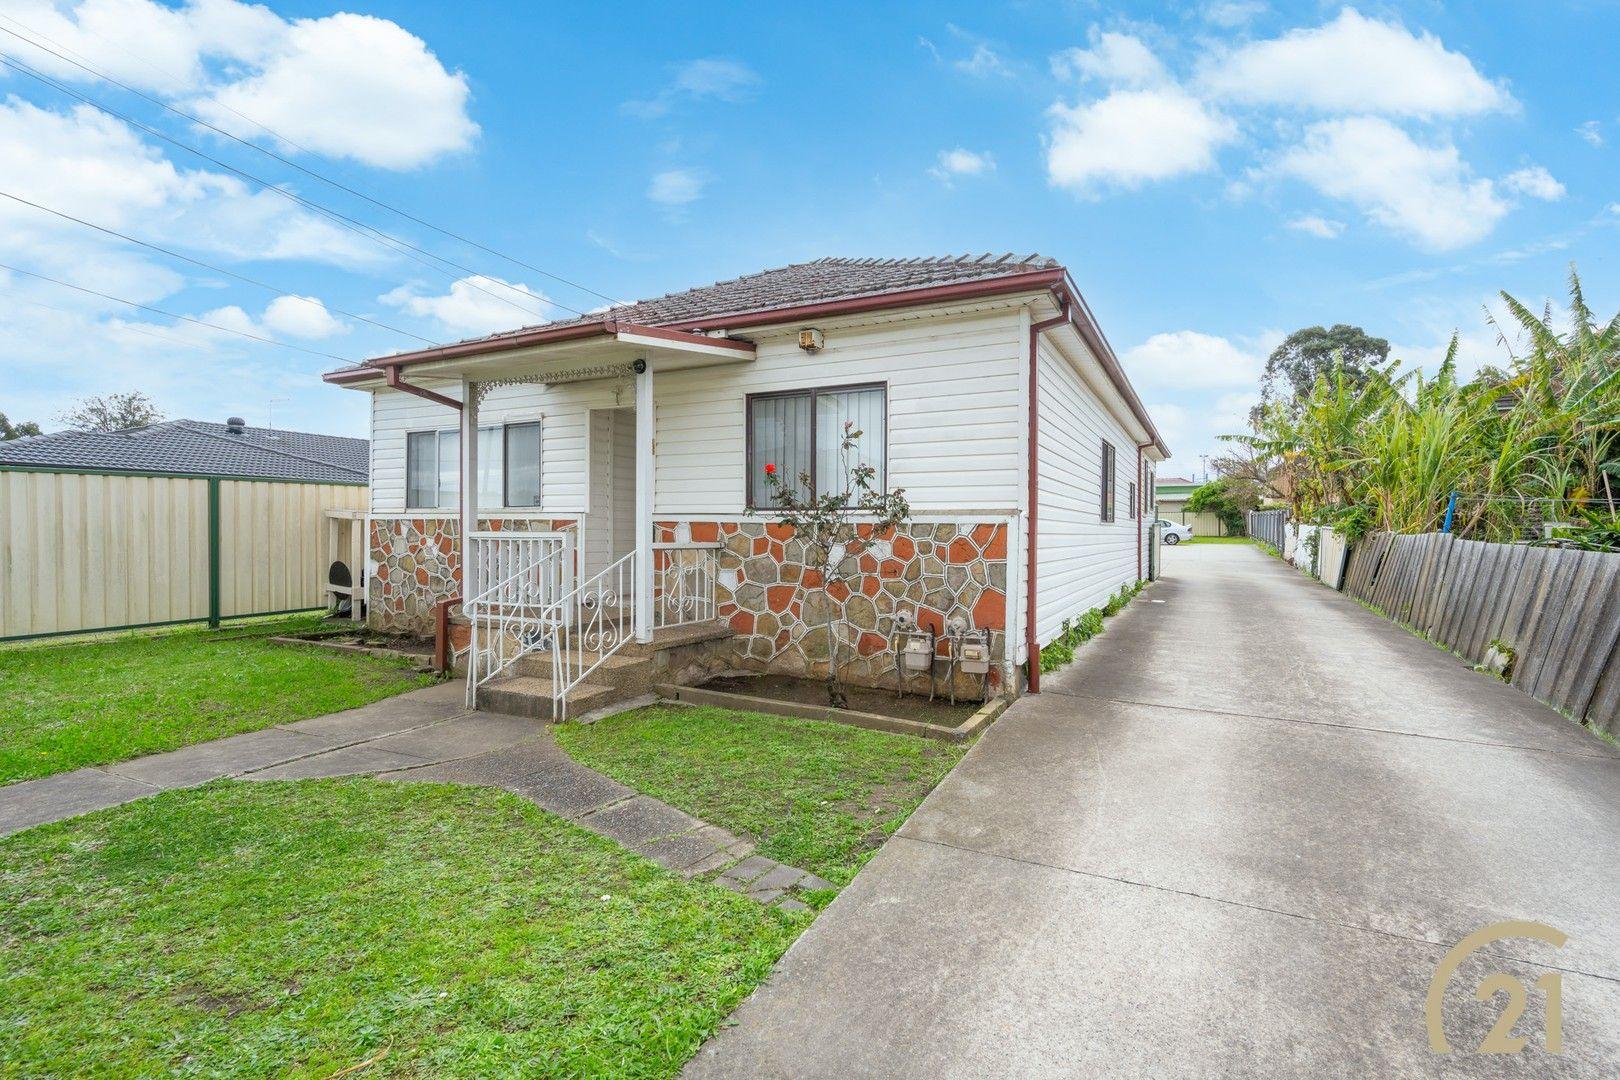 189 Fairfield Street, Yennora NSW 2161, Image 0